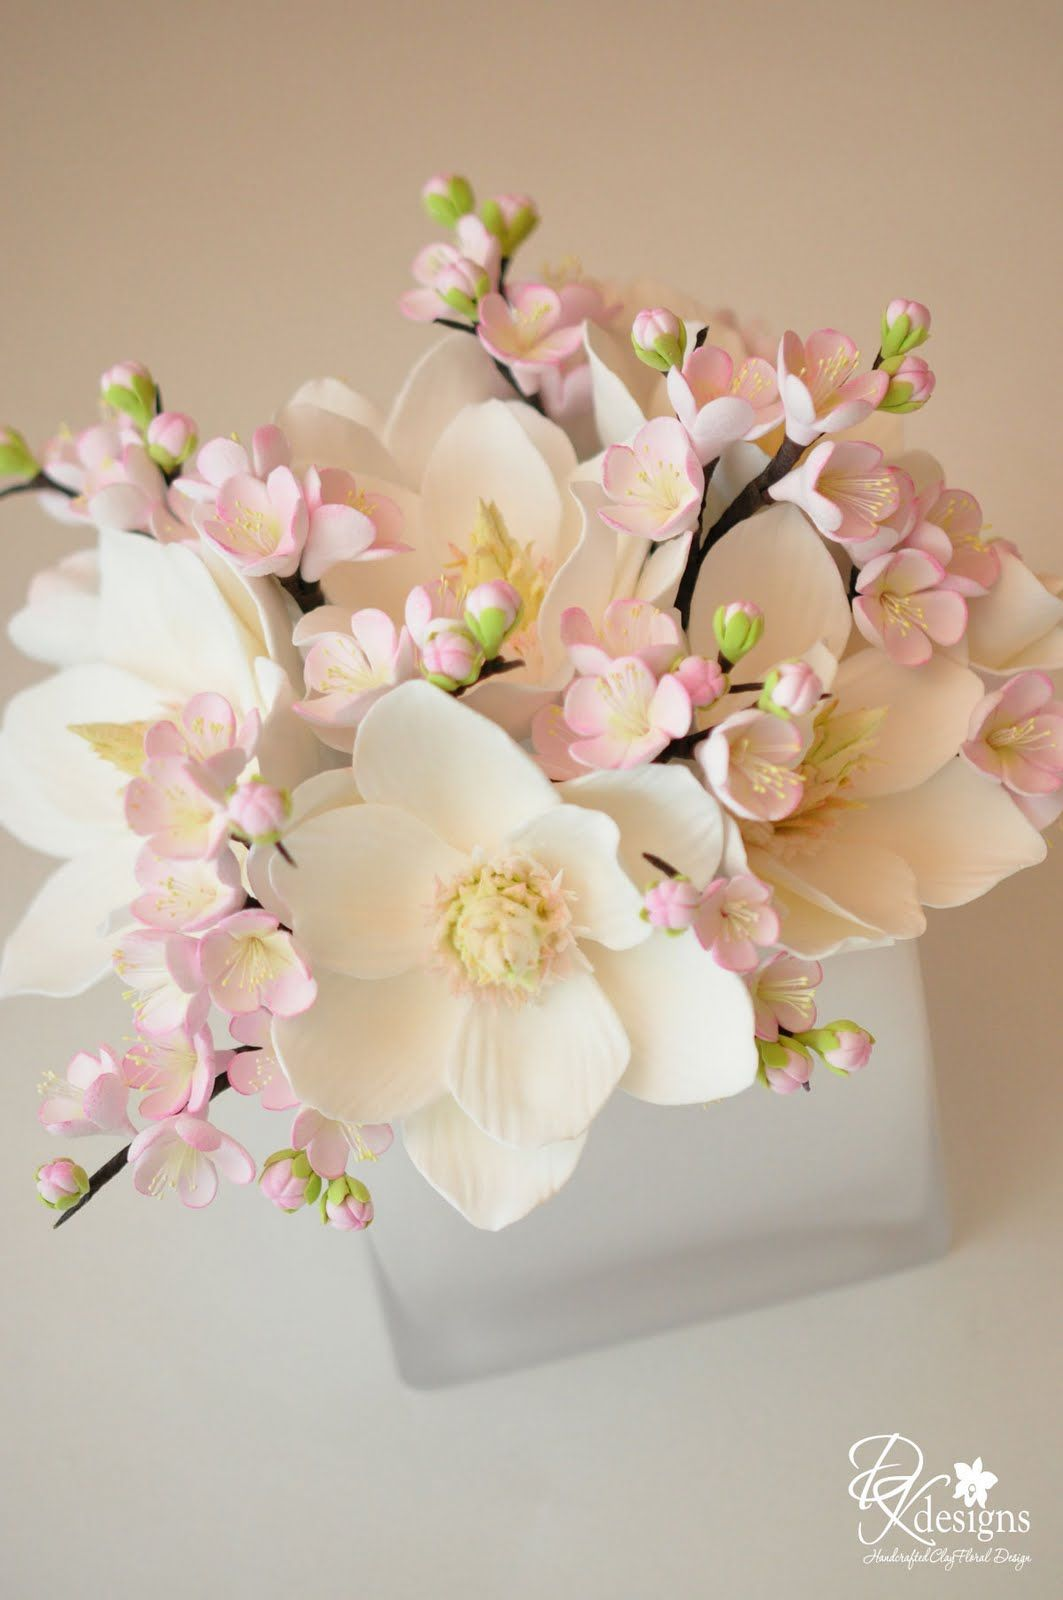 Delicate Blush And White Floral Arrangement Magnolias And Plum